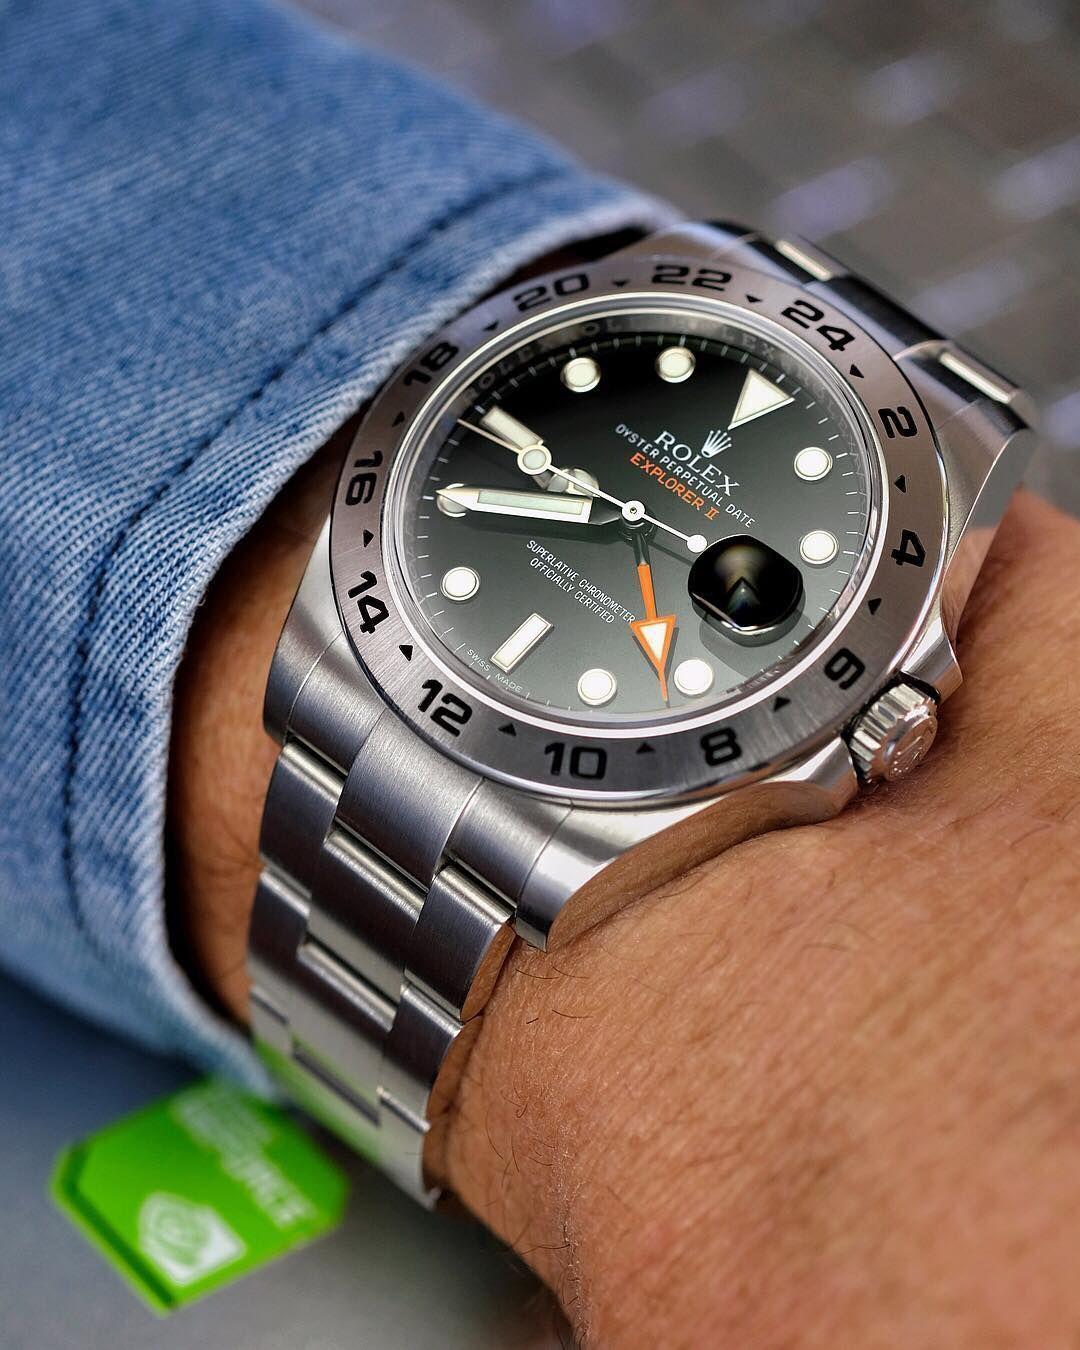 "@nicedily on Instagram: "". Rolex Explorer II 216570 . #rolexexplorer2 #rolexexplorer2blackdial #rolex #watch #watches #watchgeek #horology #wristwatch #dailywatch…"" #rolexexplorer @nicedily on Instagram: "". Rolex Explorer II 216570 . #rolexexplorer2 #rolexexplorer2blackdial #rolex #watch #watches #watchgeek #horology #wristwatch #dailywatch…"" #rolexwatches"